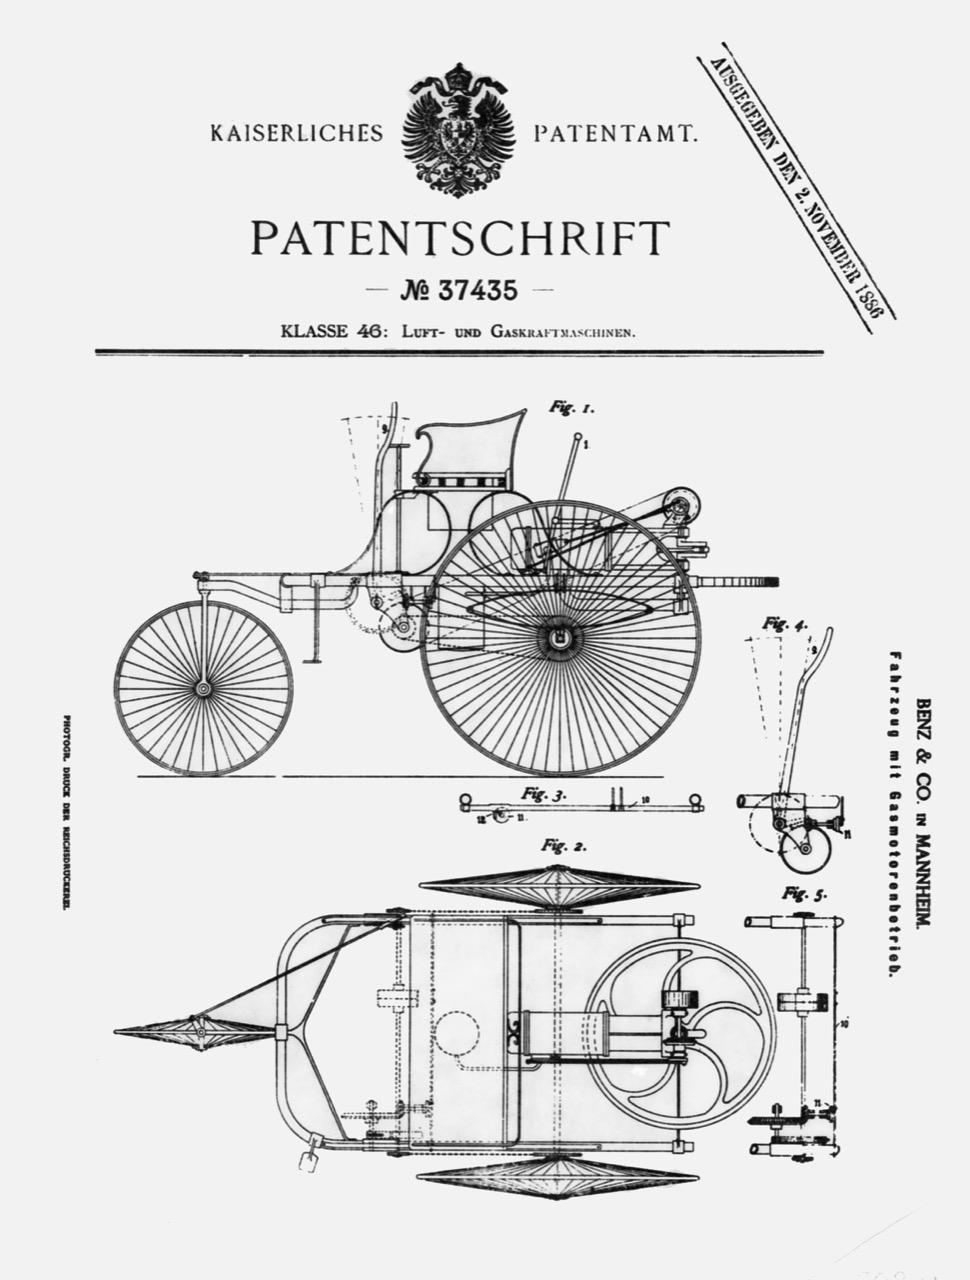 Patent Motorwagen di Karl Benz - Mercedes Benz festeggia l'anniversario